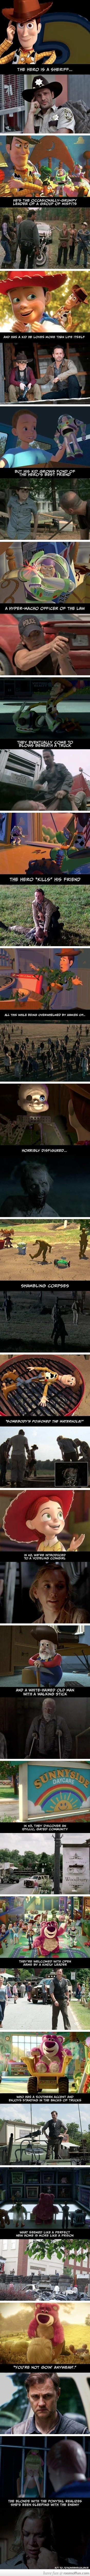 walking dead v toy story